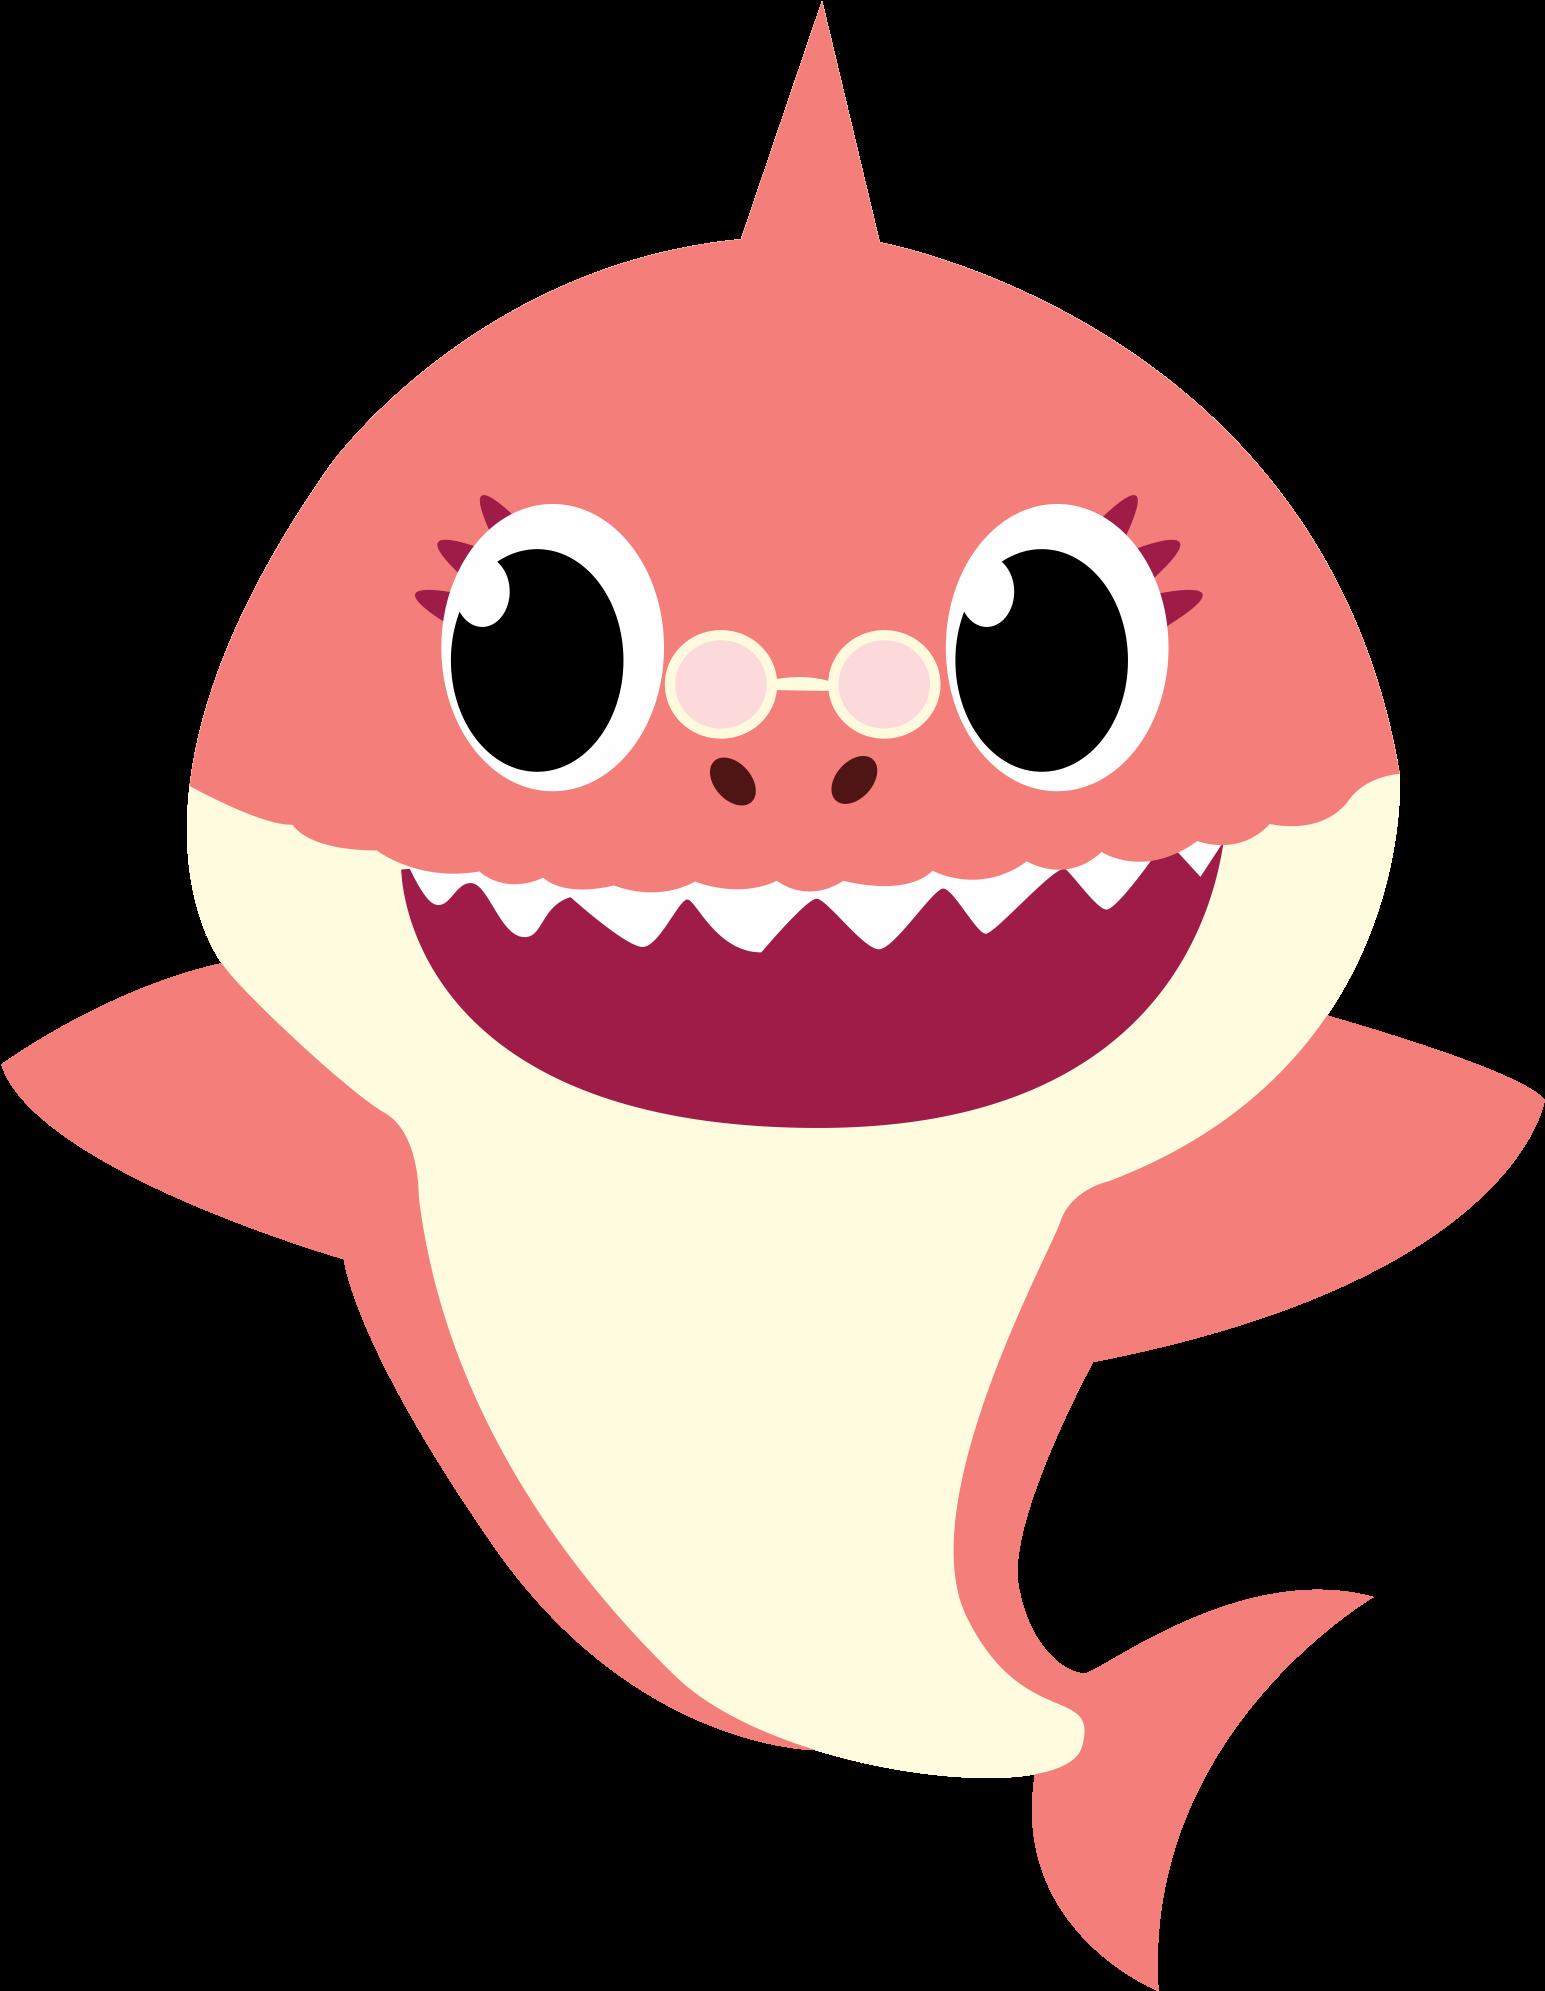 Baby Shark Em Png , Transparent Cartoon - Jing.fm